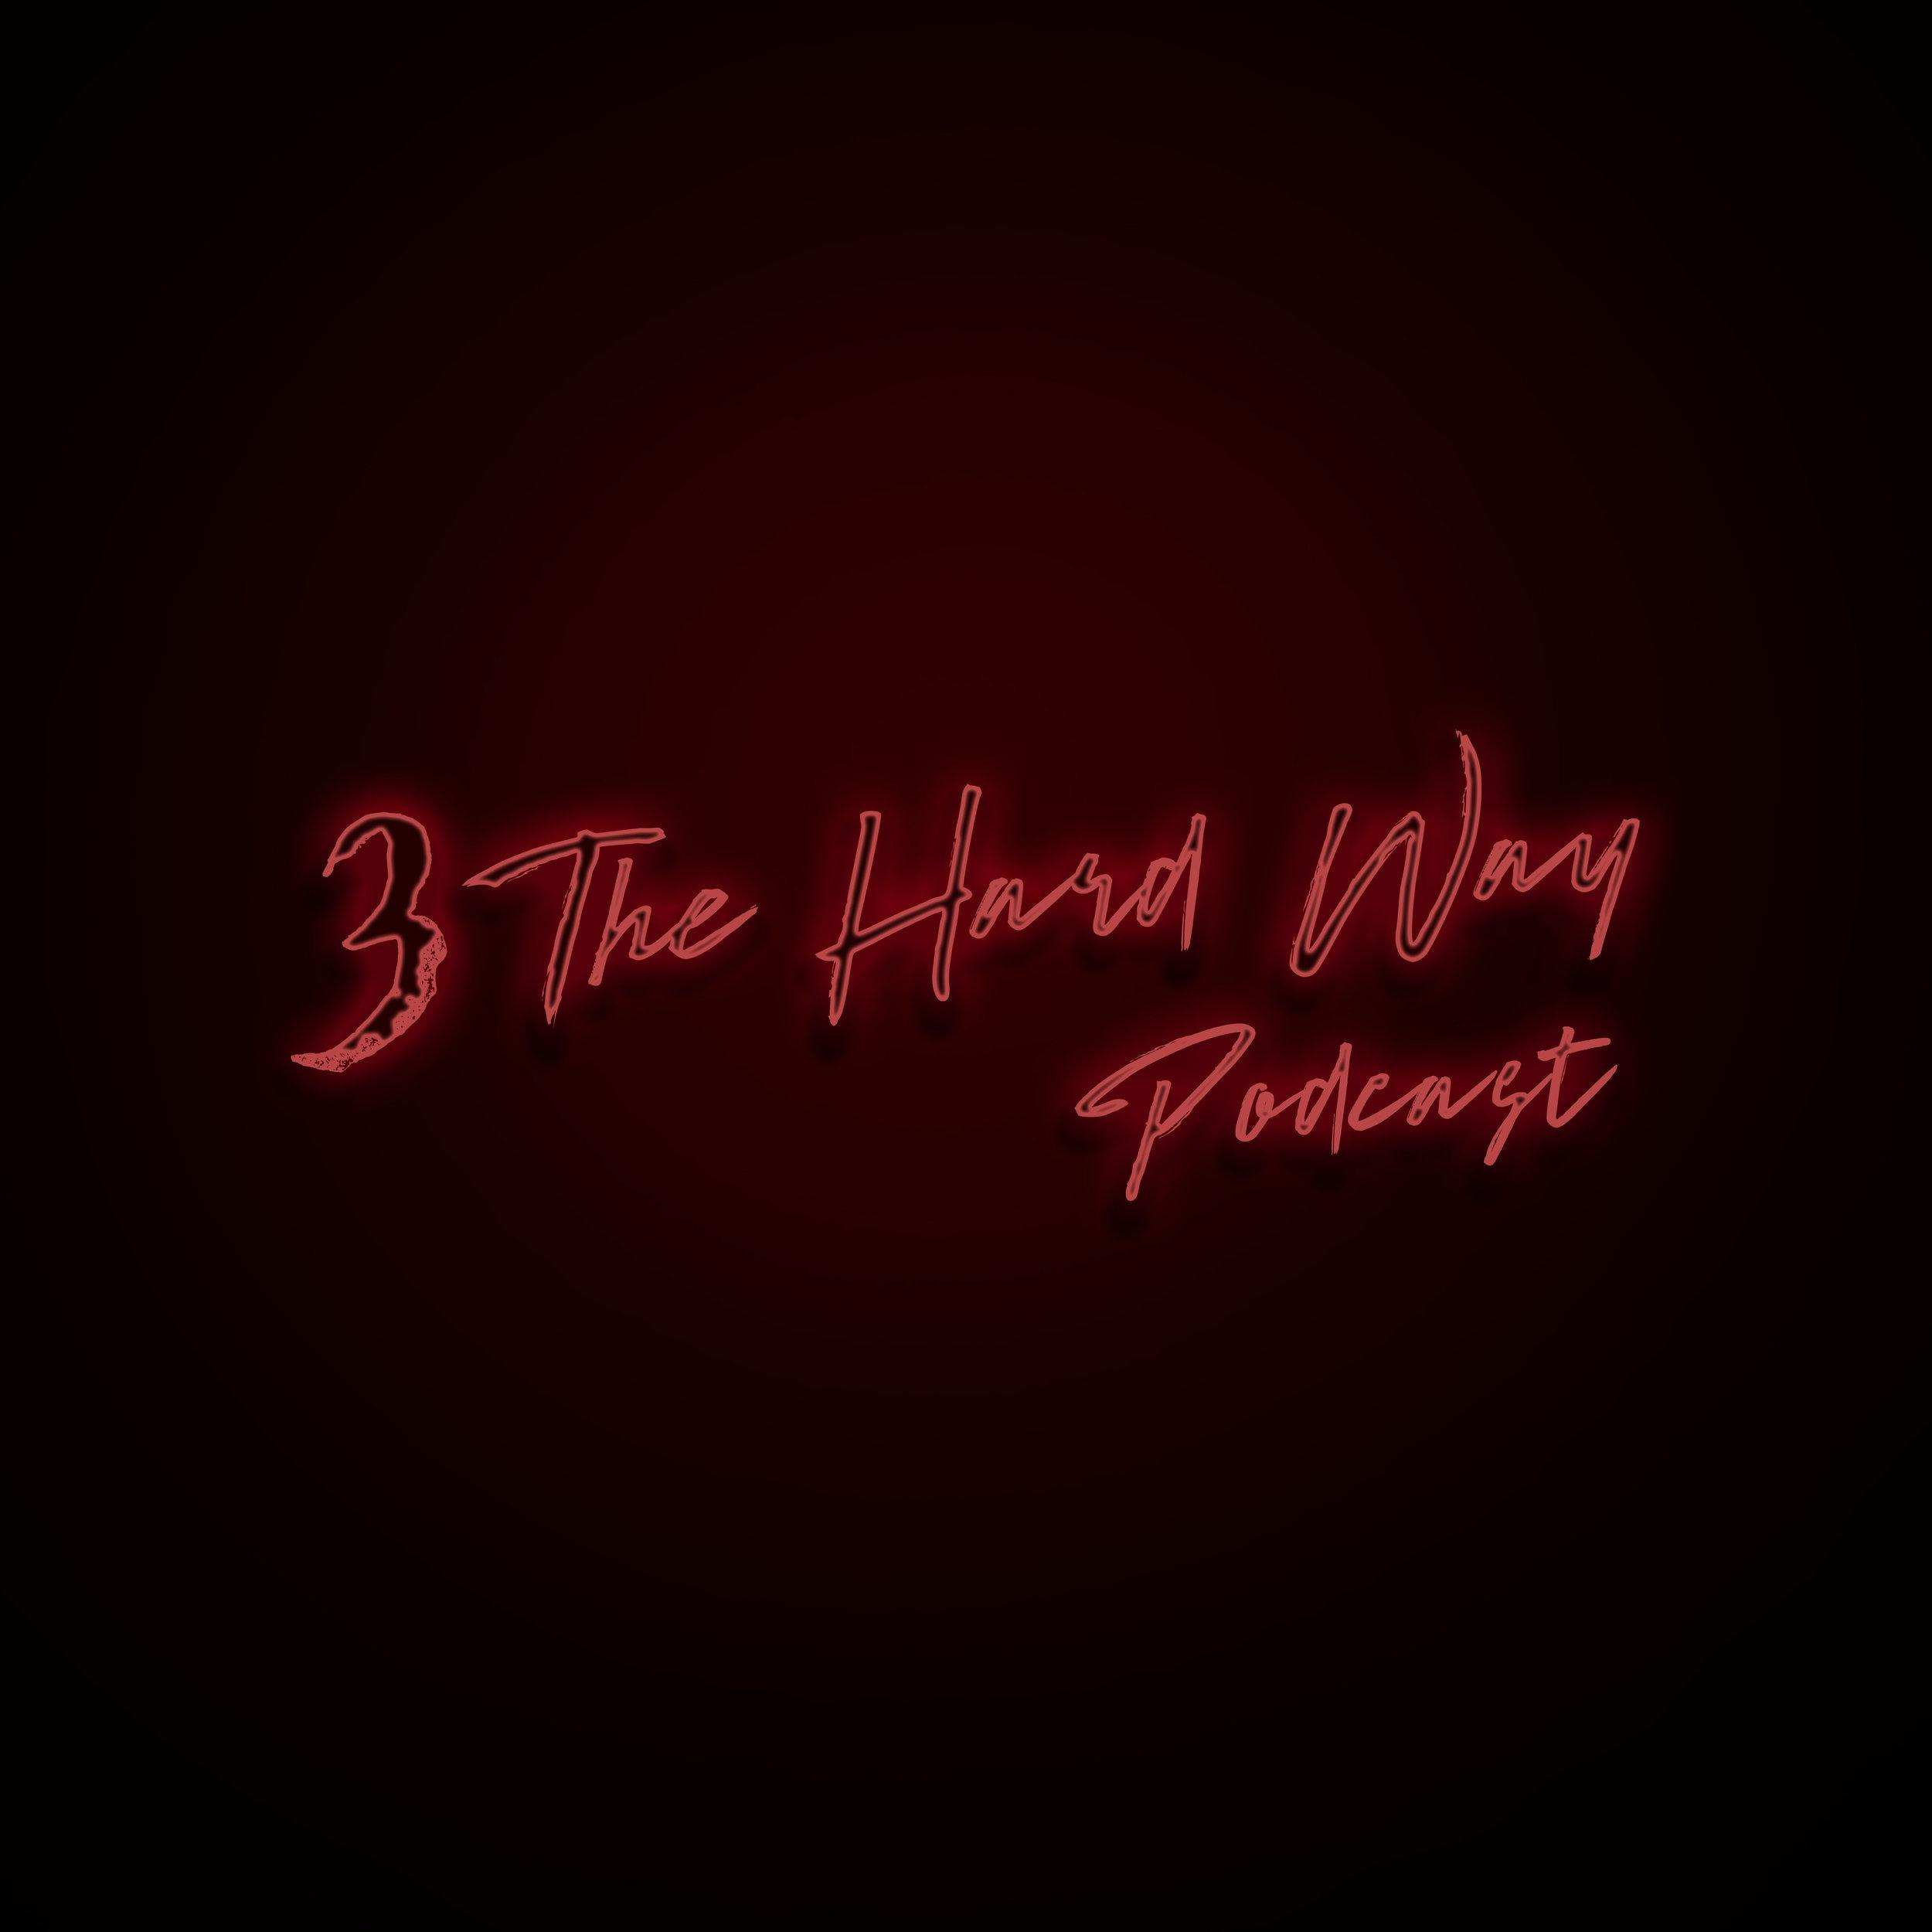 Three the hard way - Promo 2.jpg